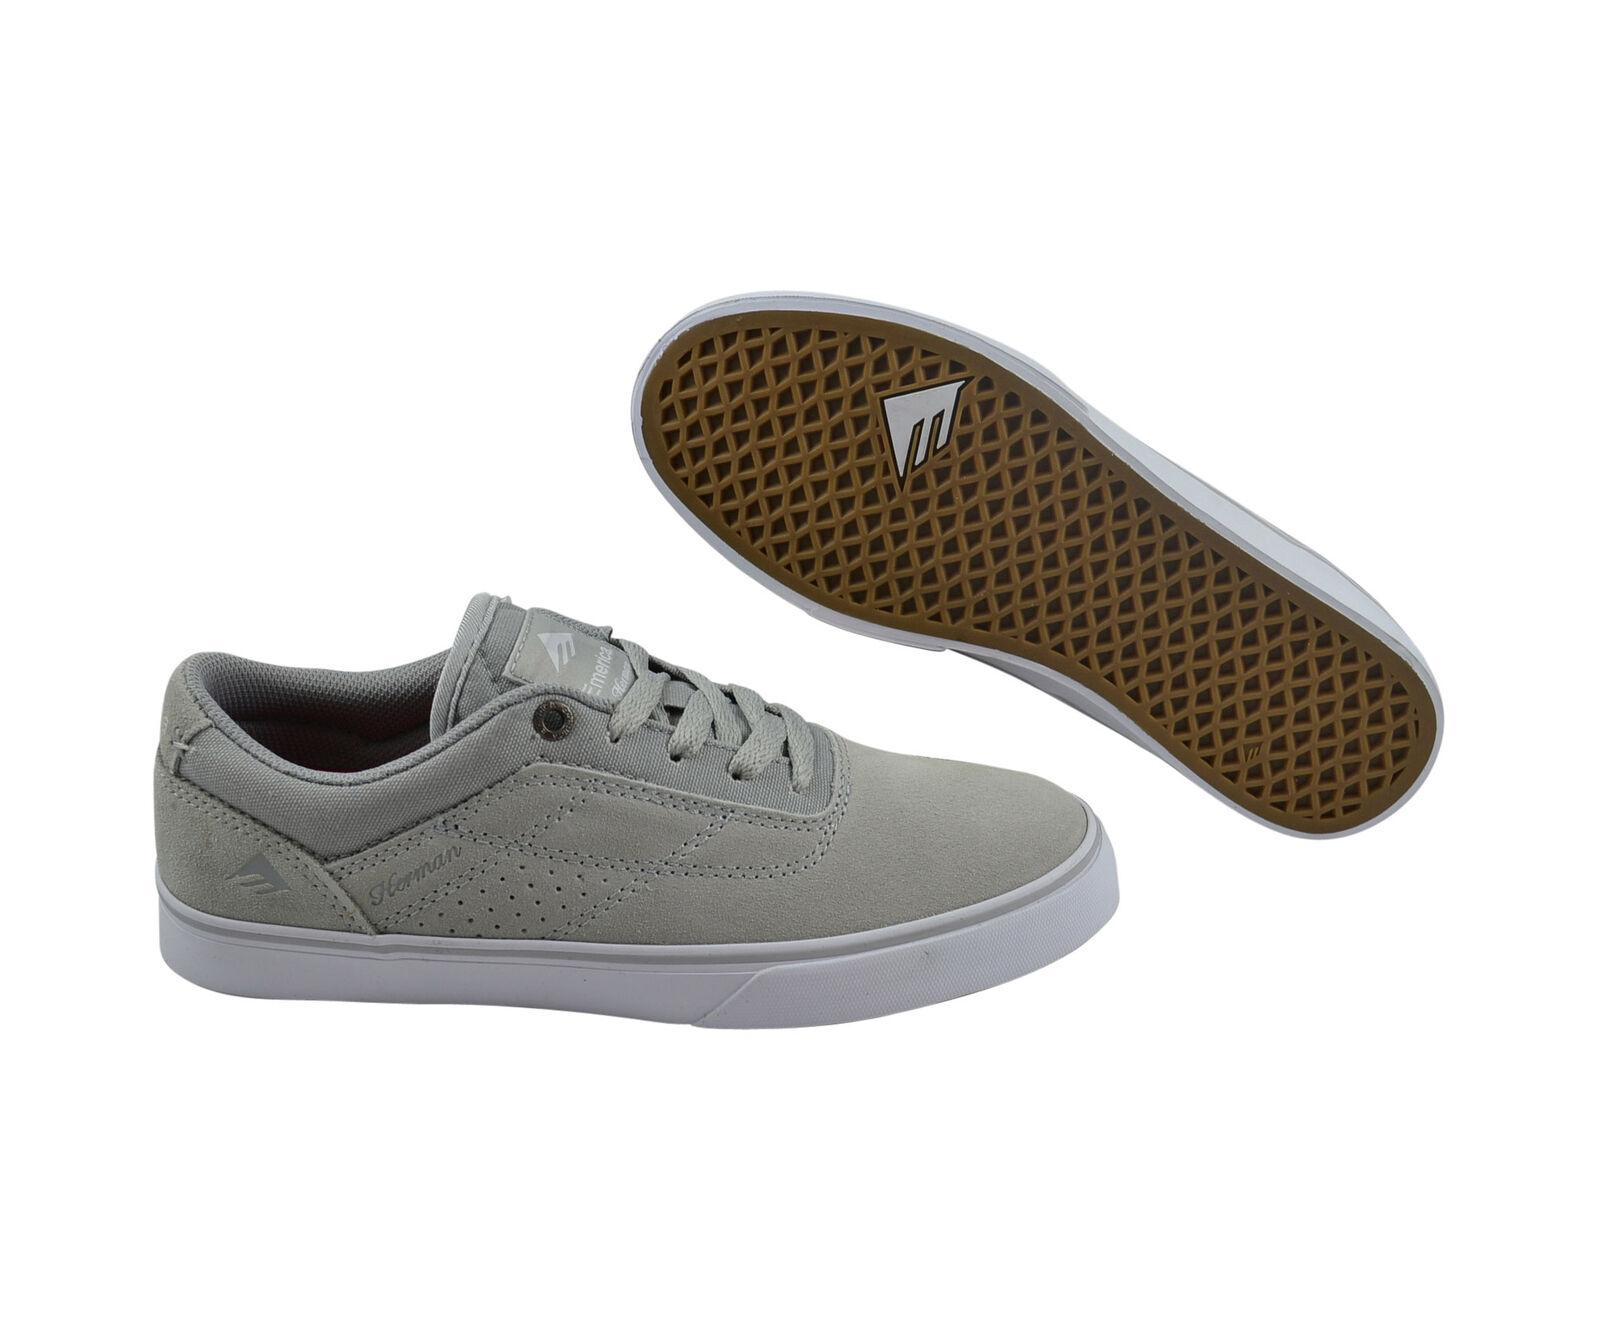 Emerica The Herman grau G6 Vulc light Grau Skater Turnschuhe/Schuhe grau Herman b6c5a5